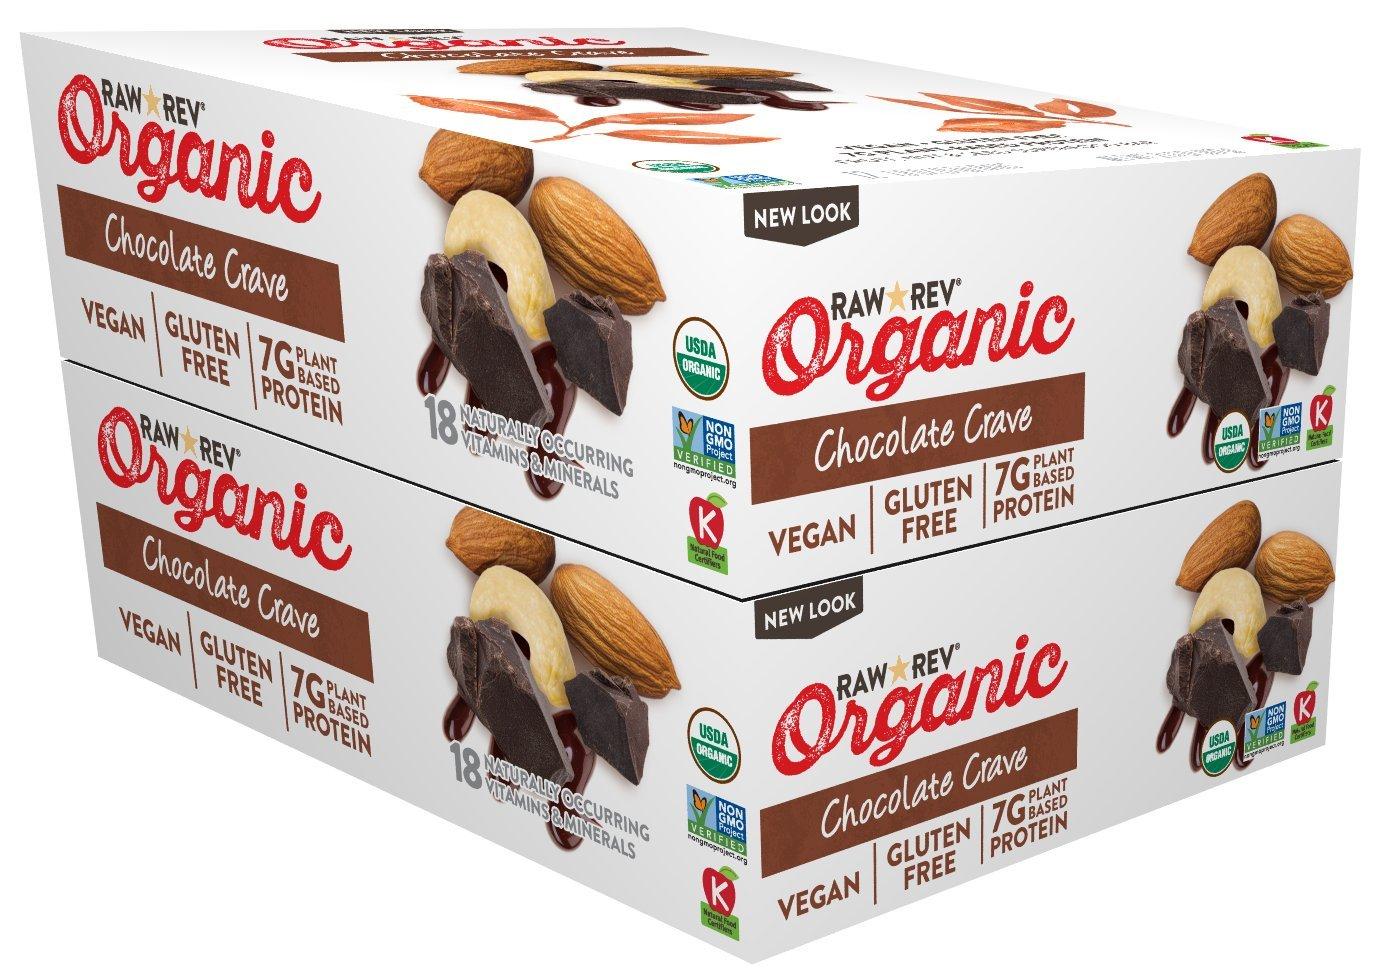 Raw Rev Organic Vegan, Gluten-Free Fruit, Nut, Seed Bars - Chocolate Crave 1.8 ounce (Pack of 24)